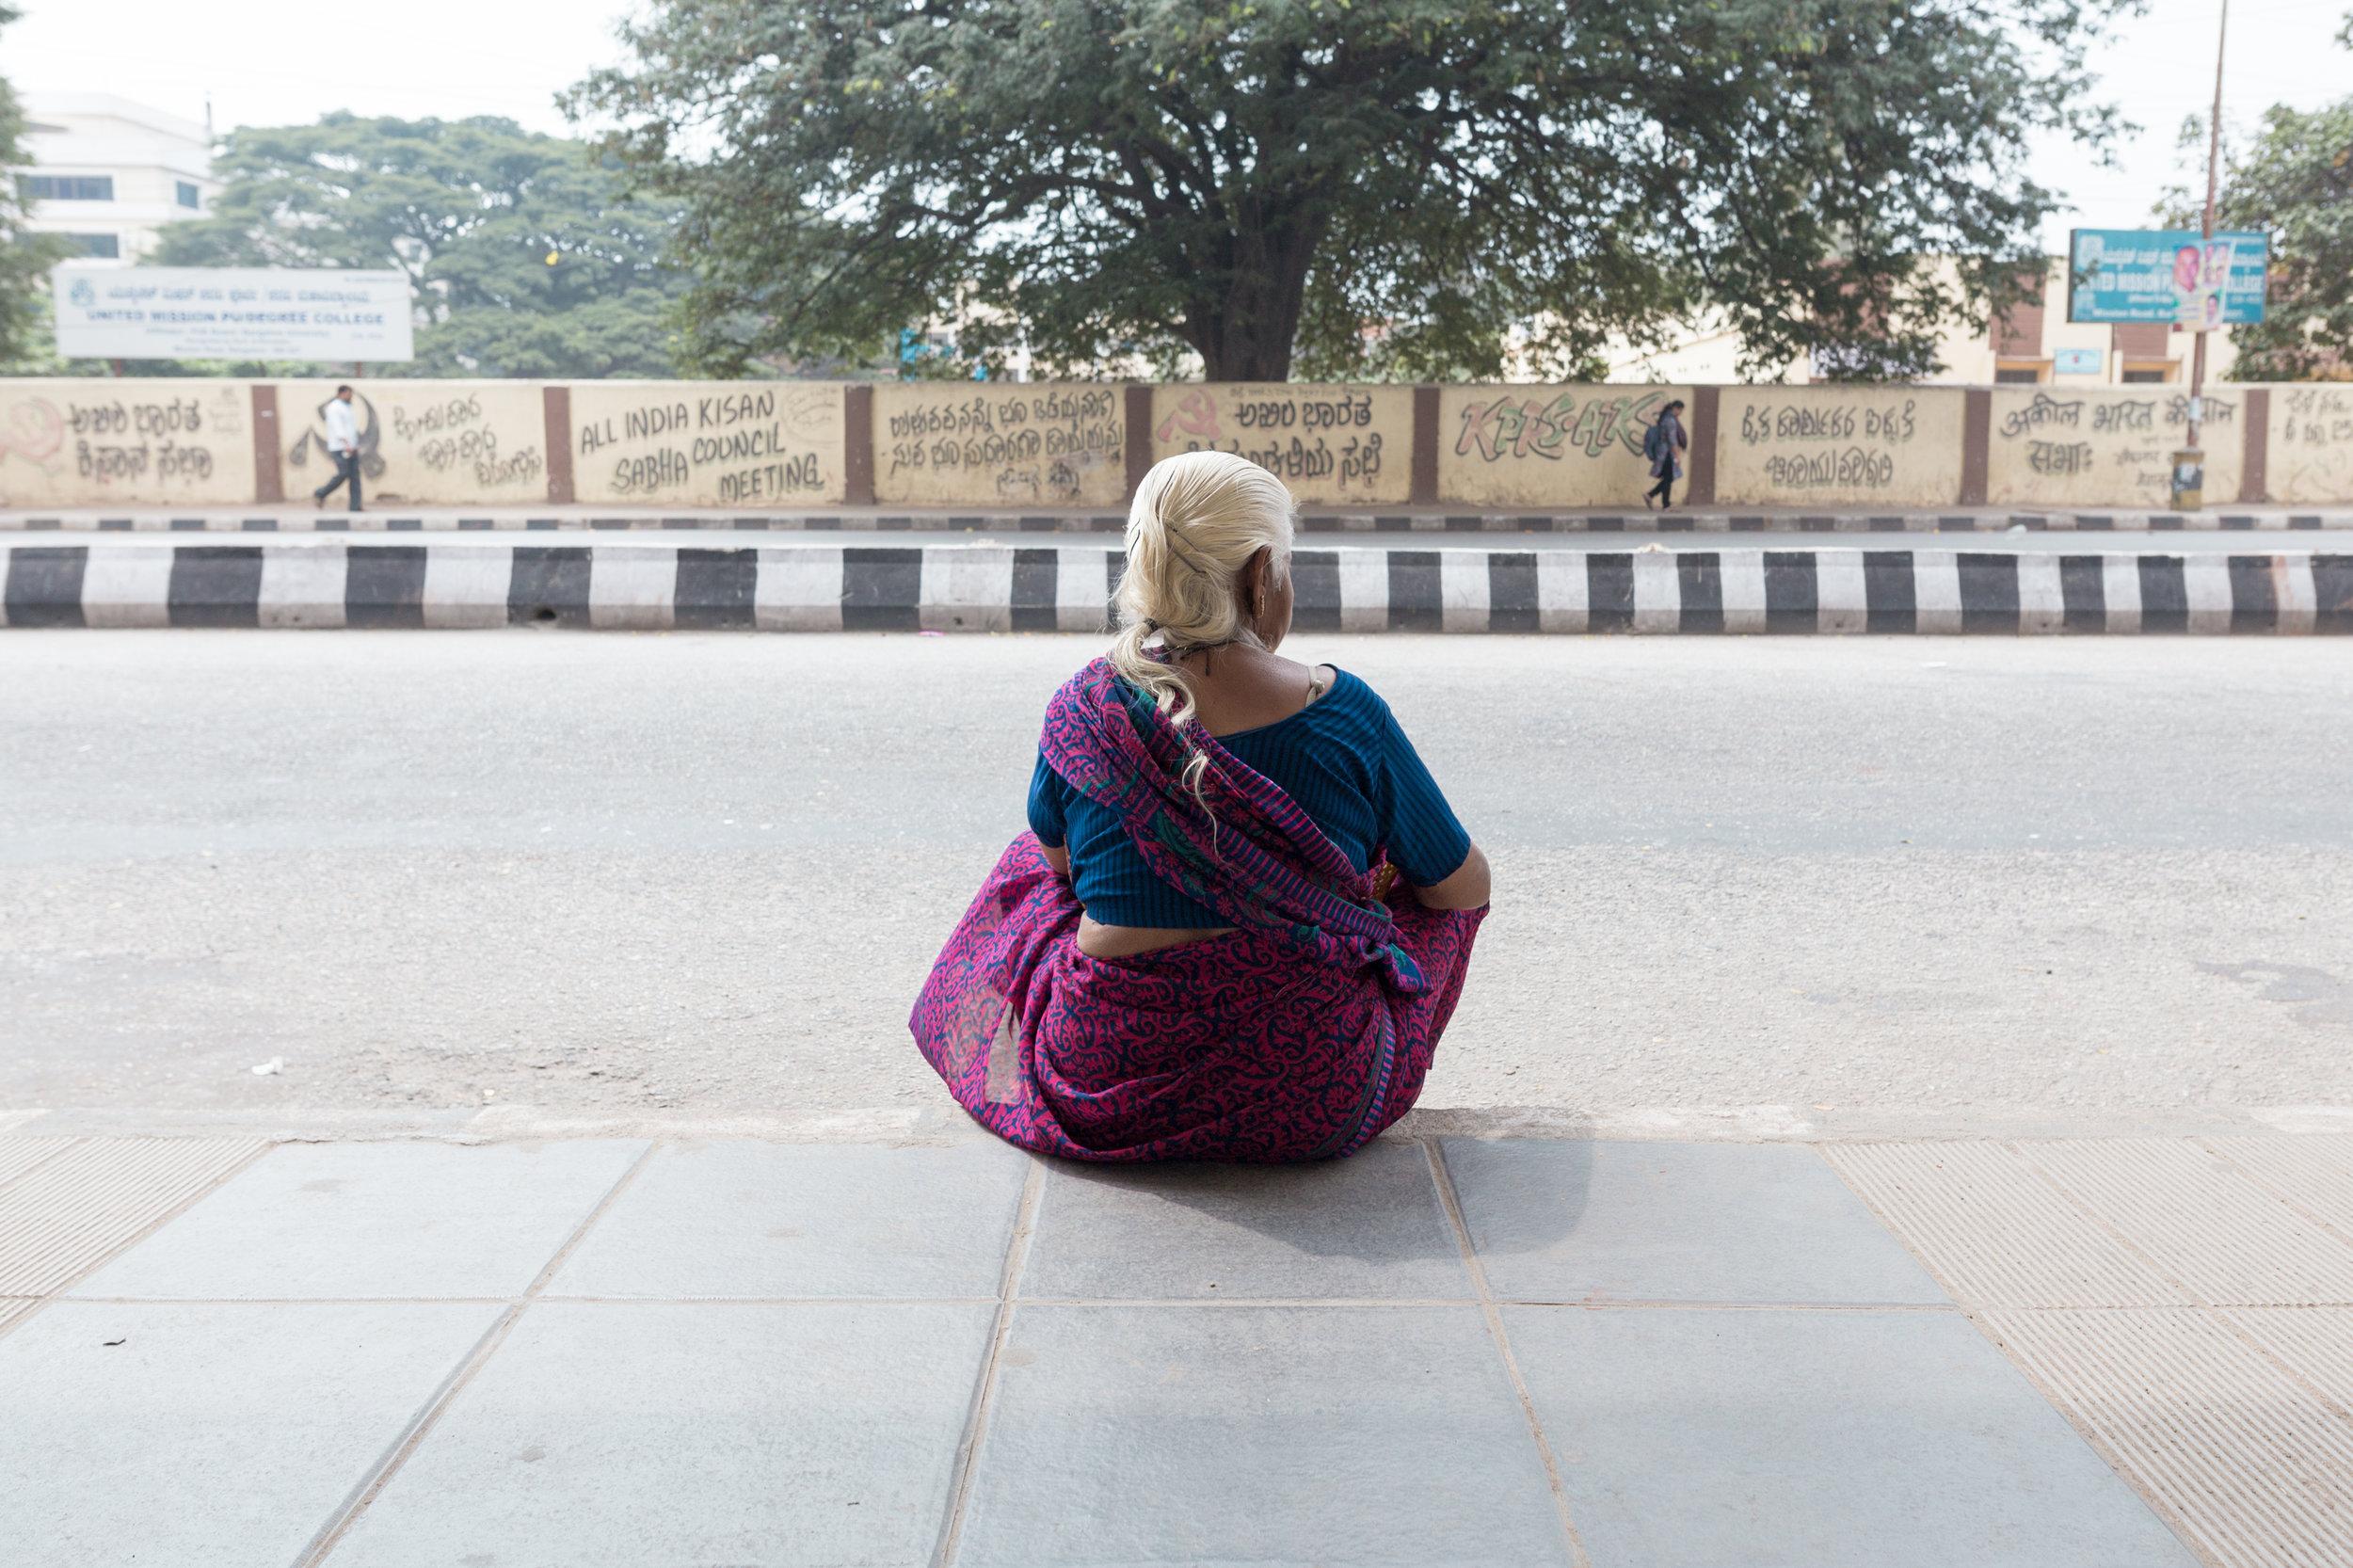 The Perfect Photo_Bangalore_-1.jpg